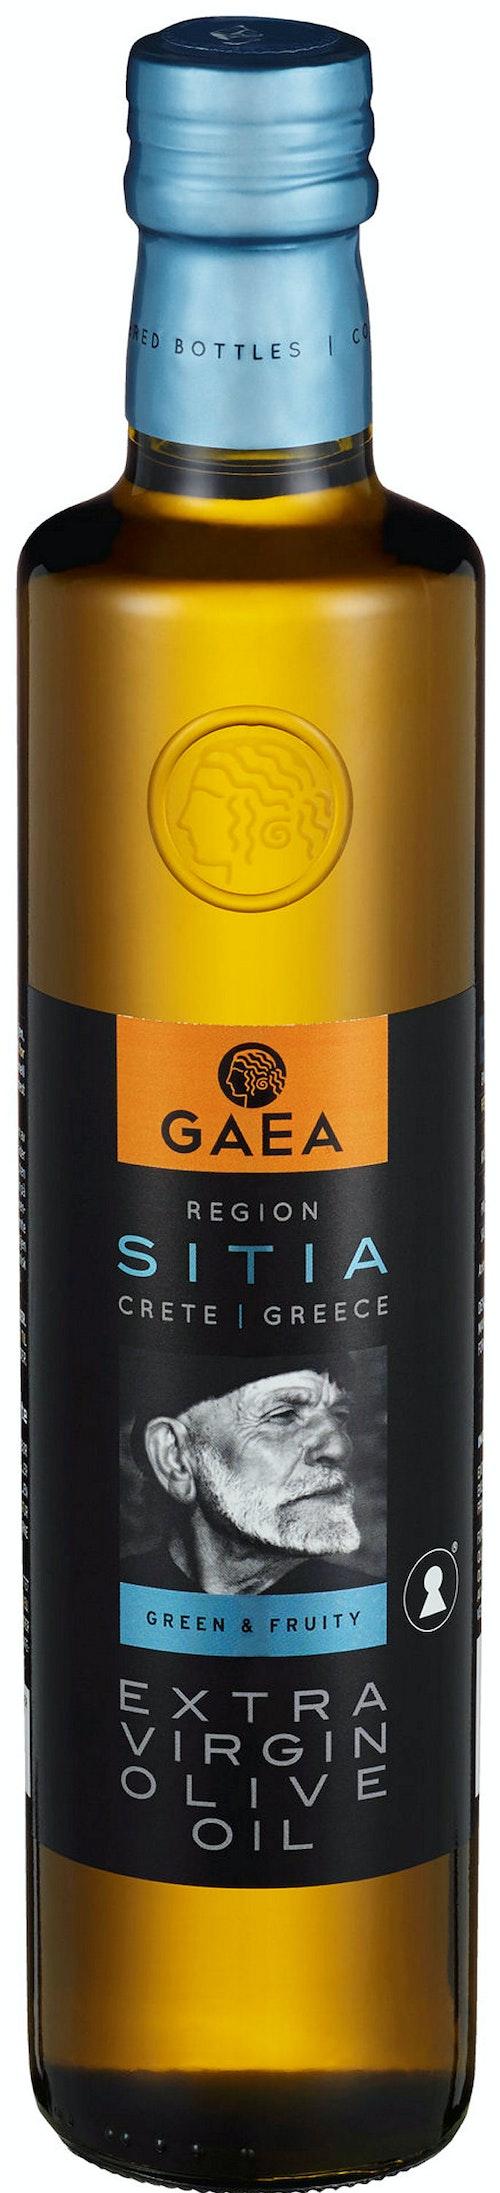 Gaea Region Sitia Extra Virgin Olive Oil 220 ml